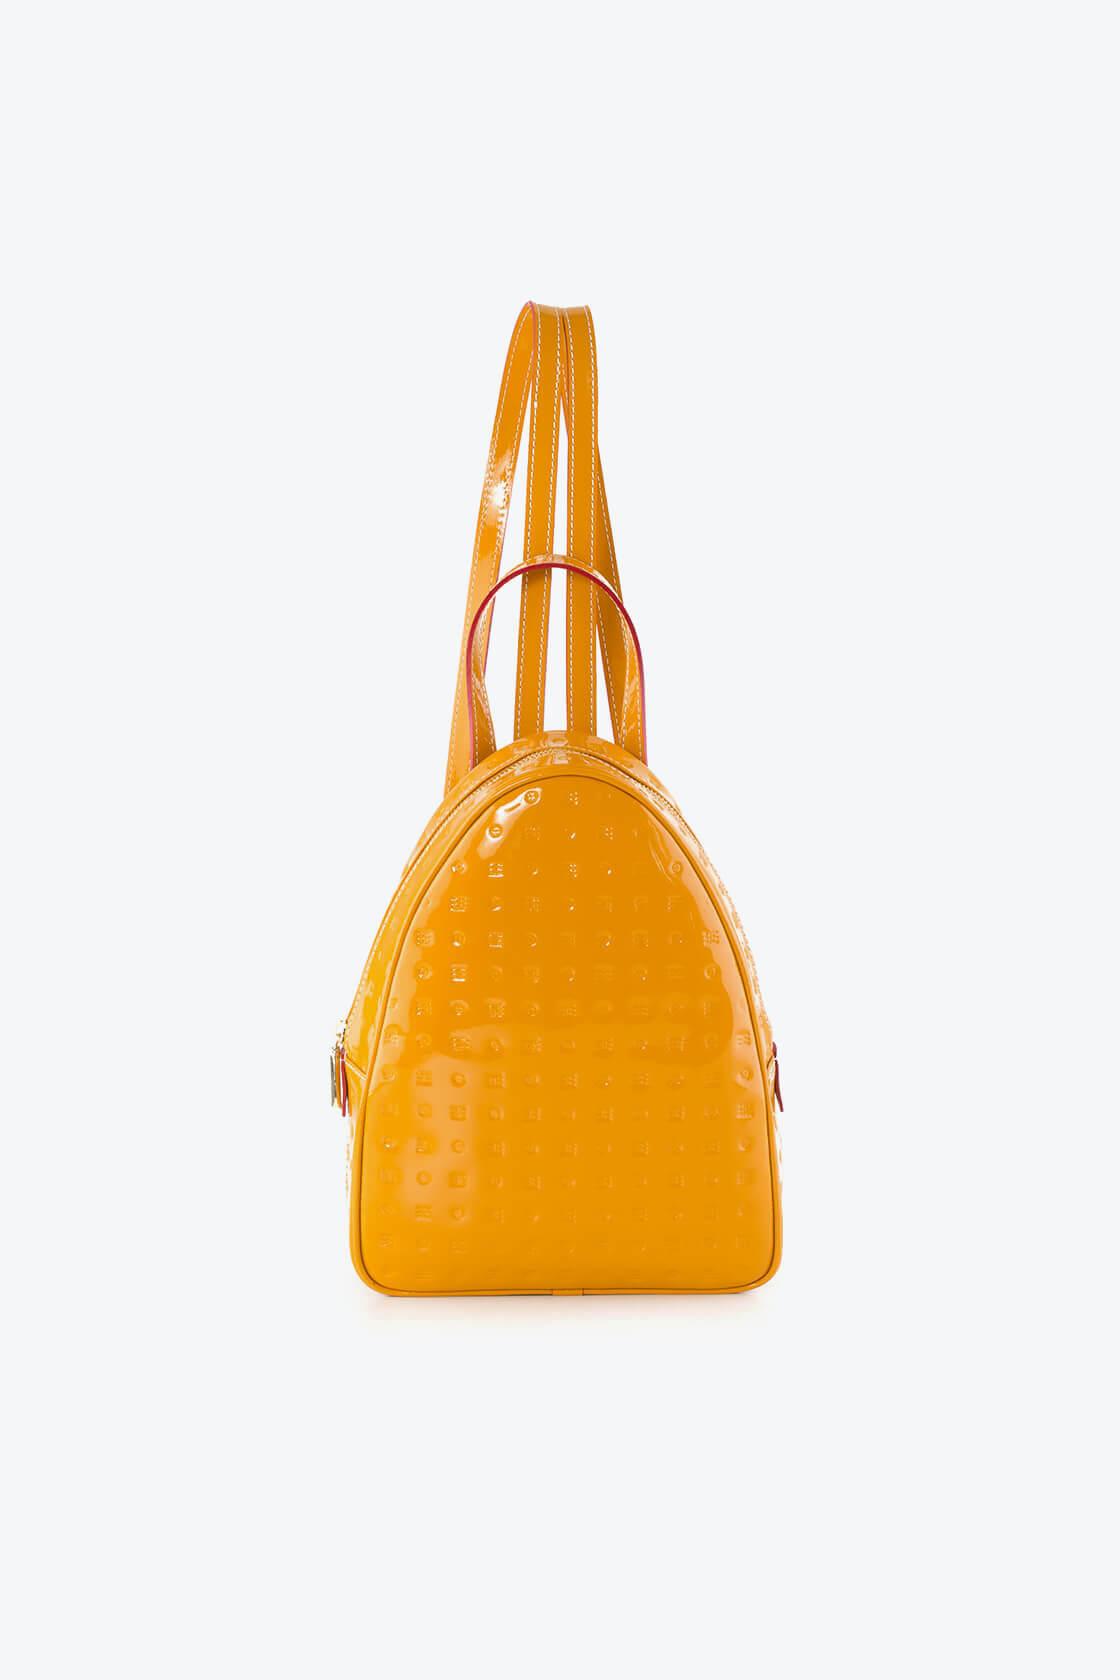 ol80000172 cheope medium backpack 1